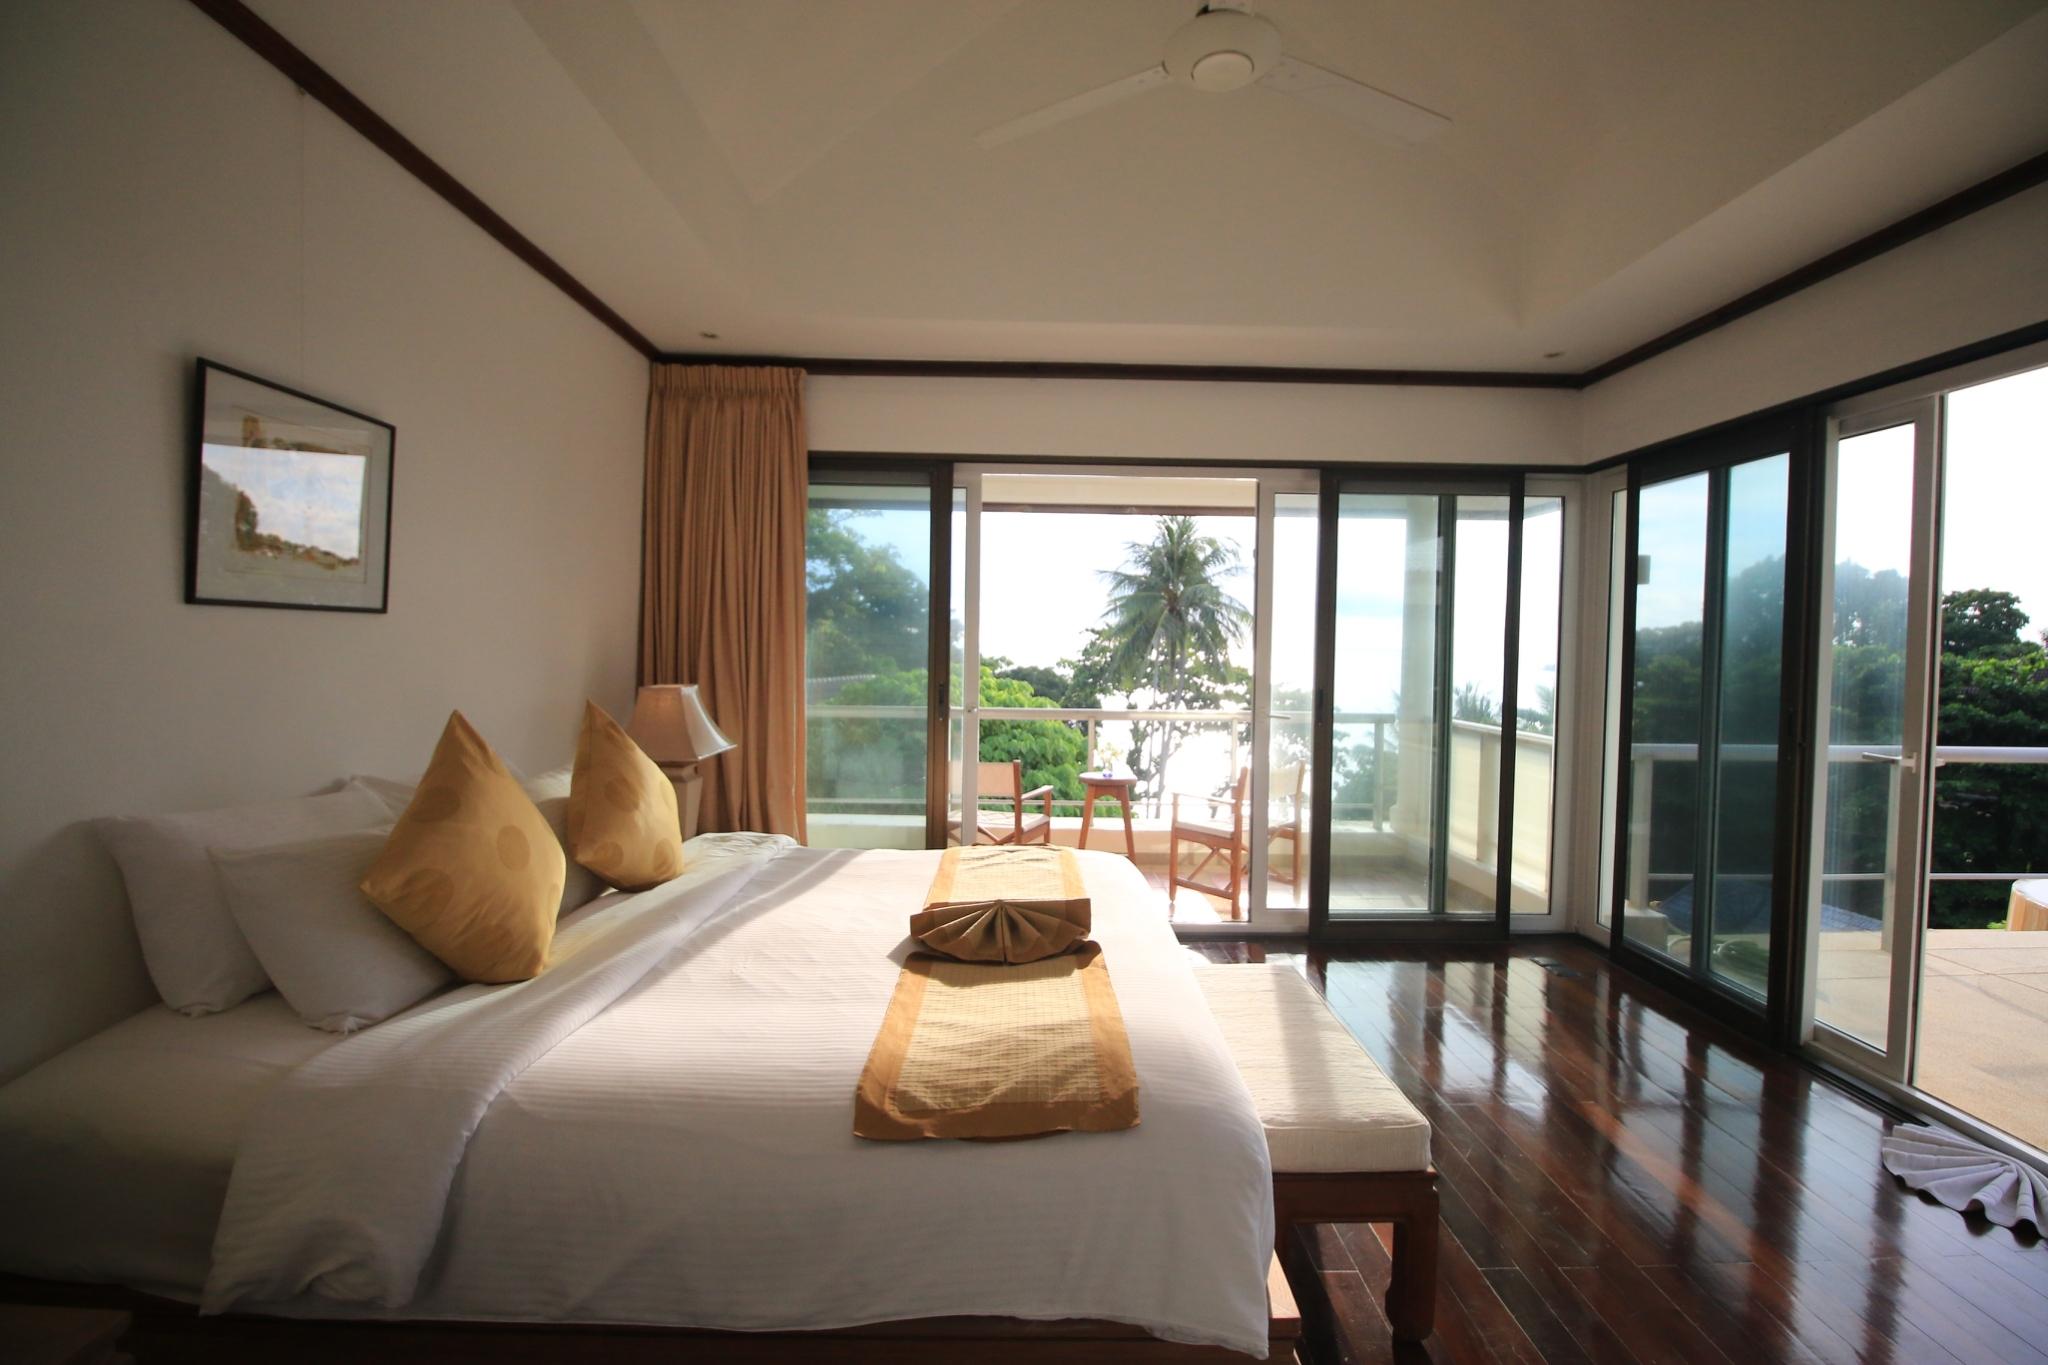 Baan Kata ocean 3 bedroom villa with private pool